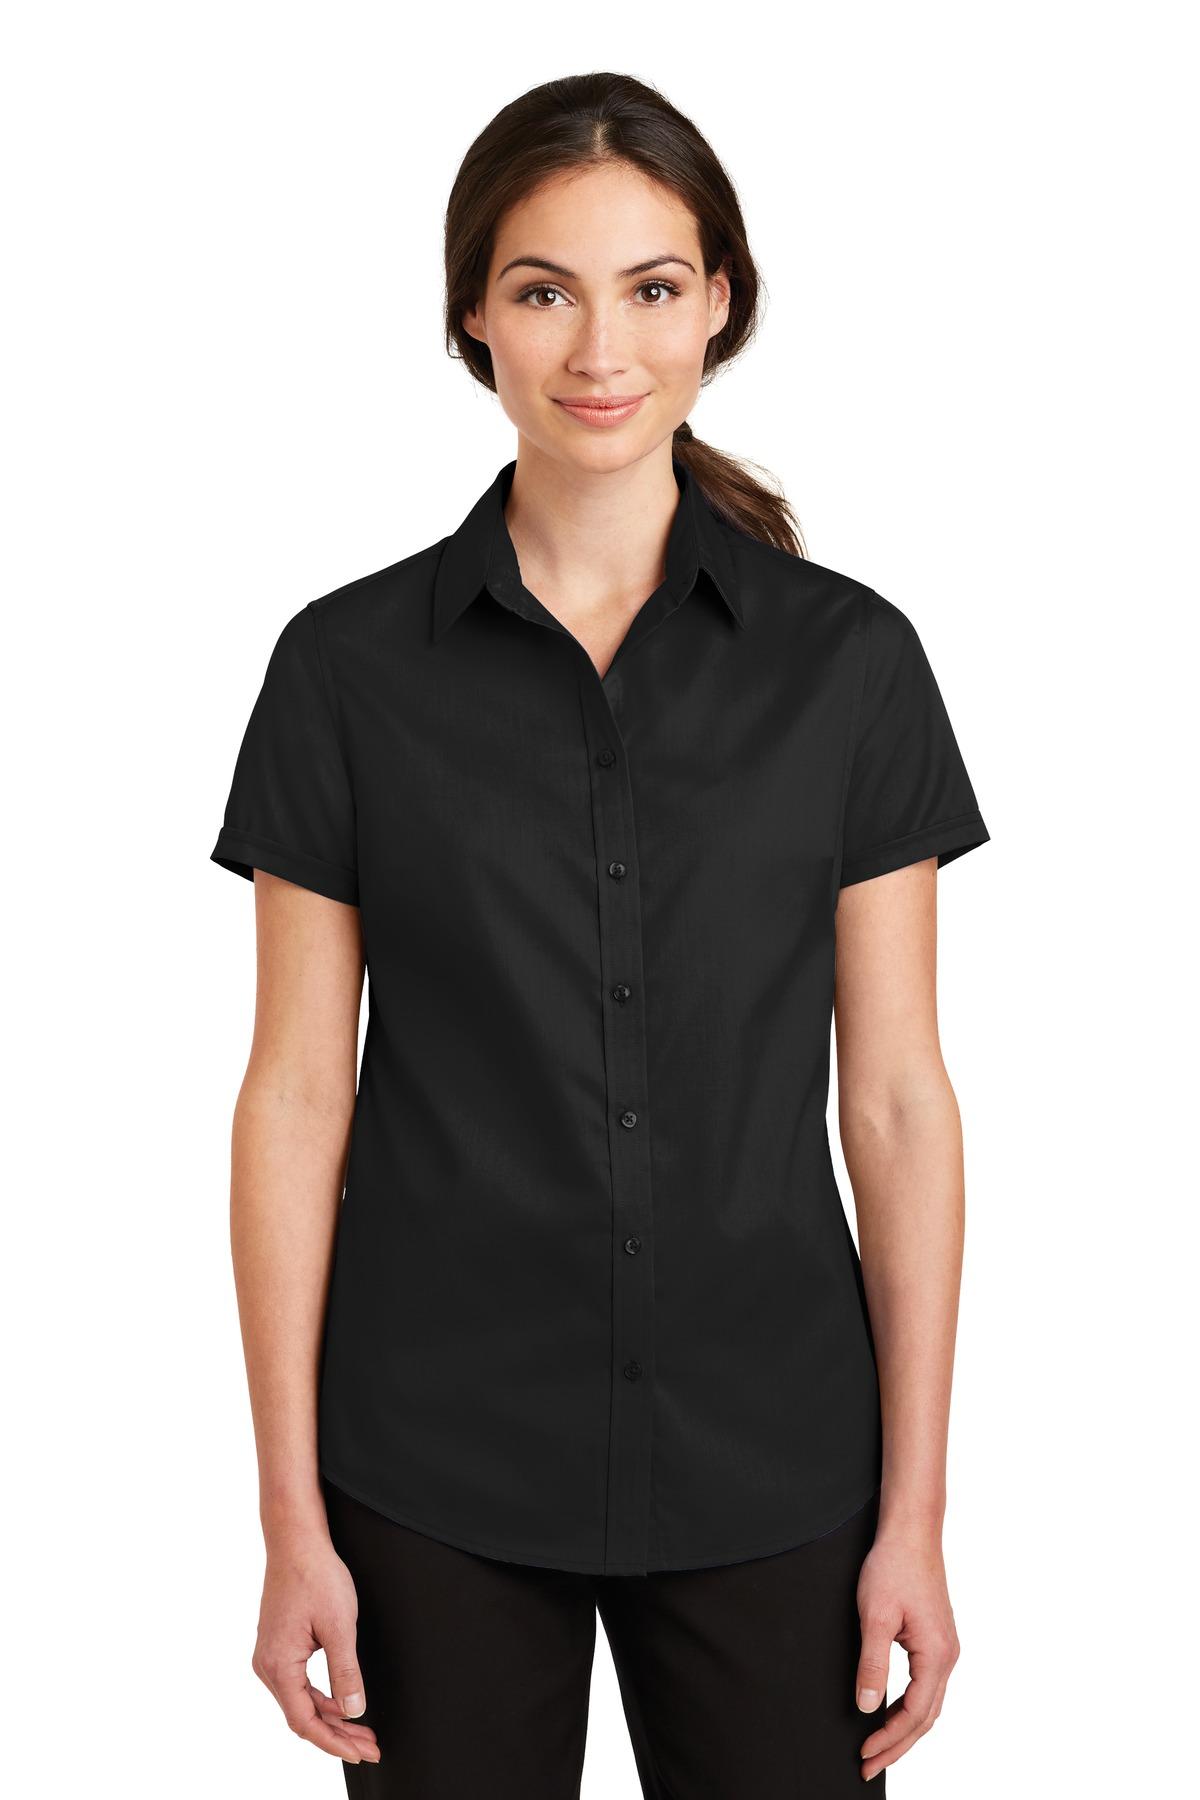 9f7d0ba20 ... Port Authority ® Ladies Short Sleeve SuperPro ™ Twill Shirt. L664.  Previous; Next